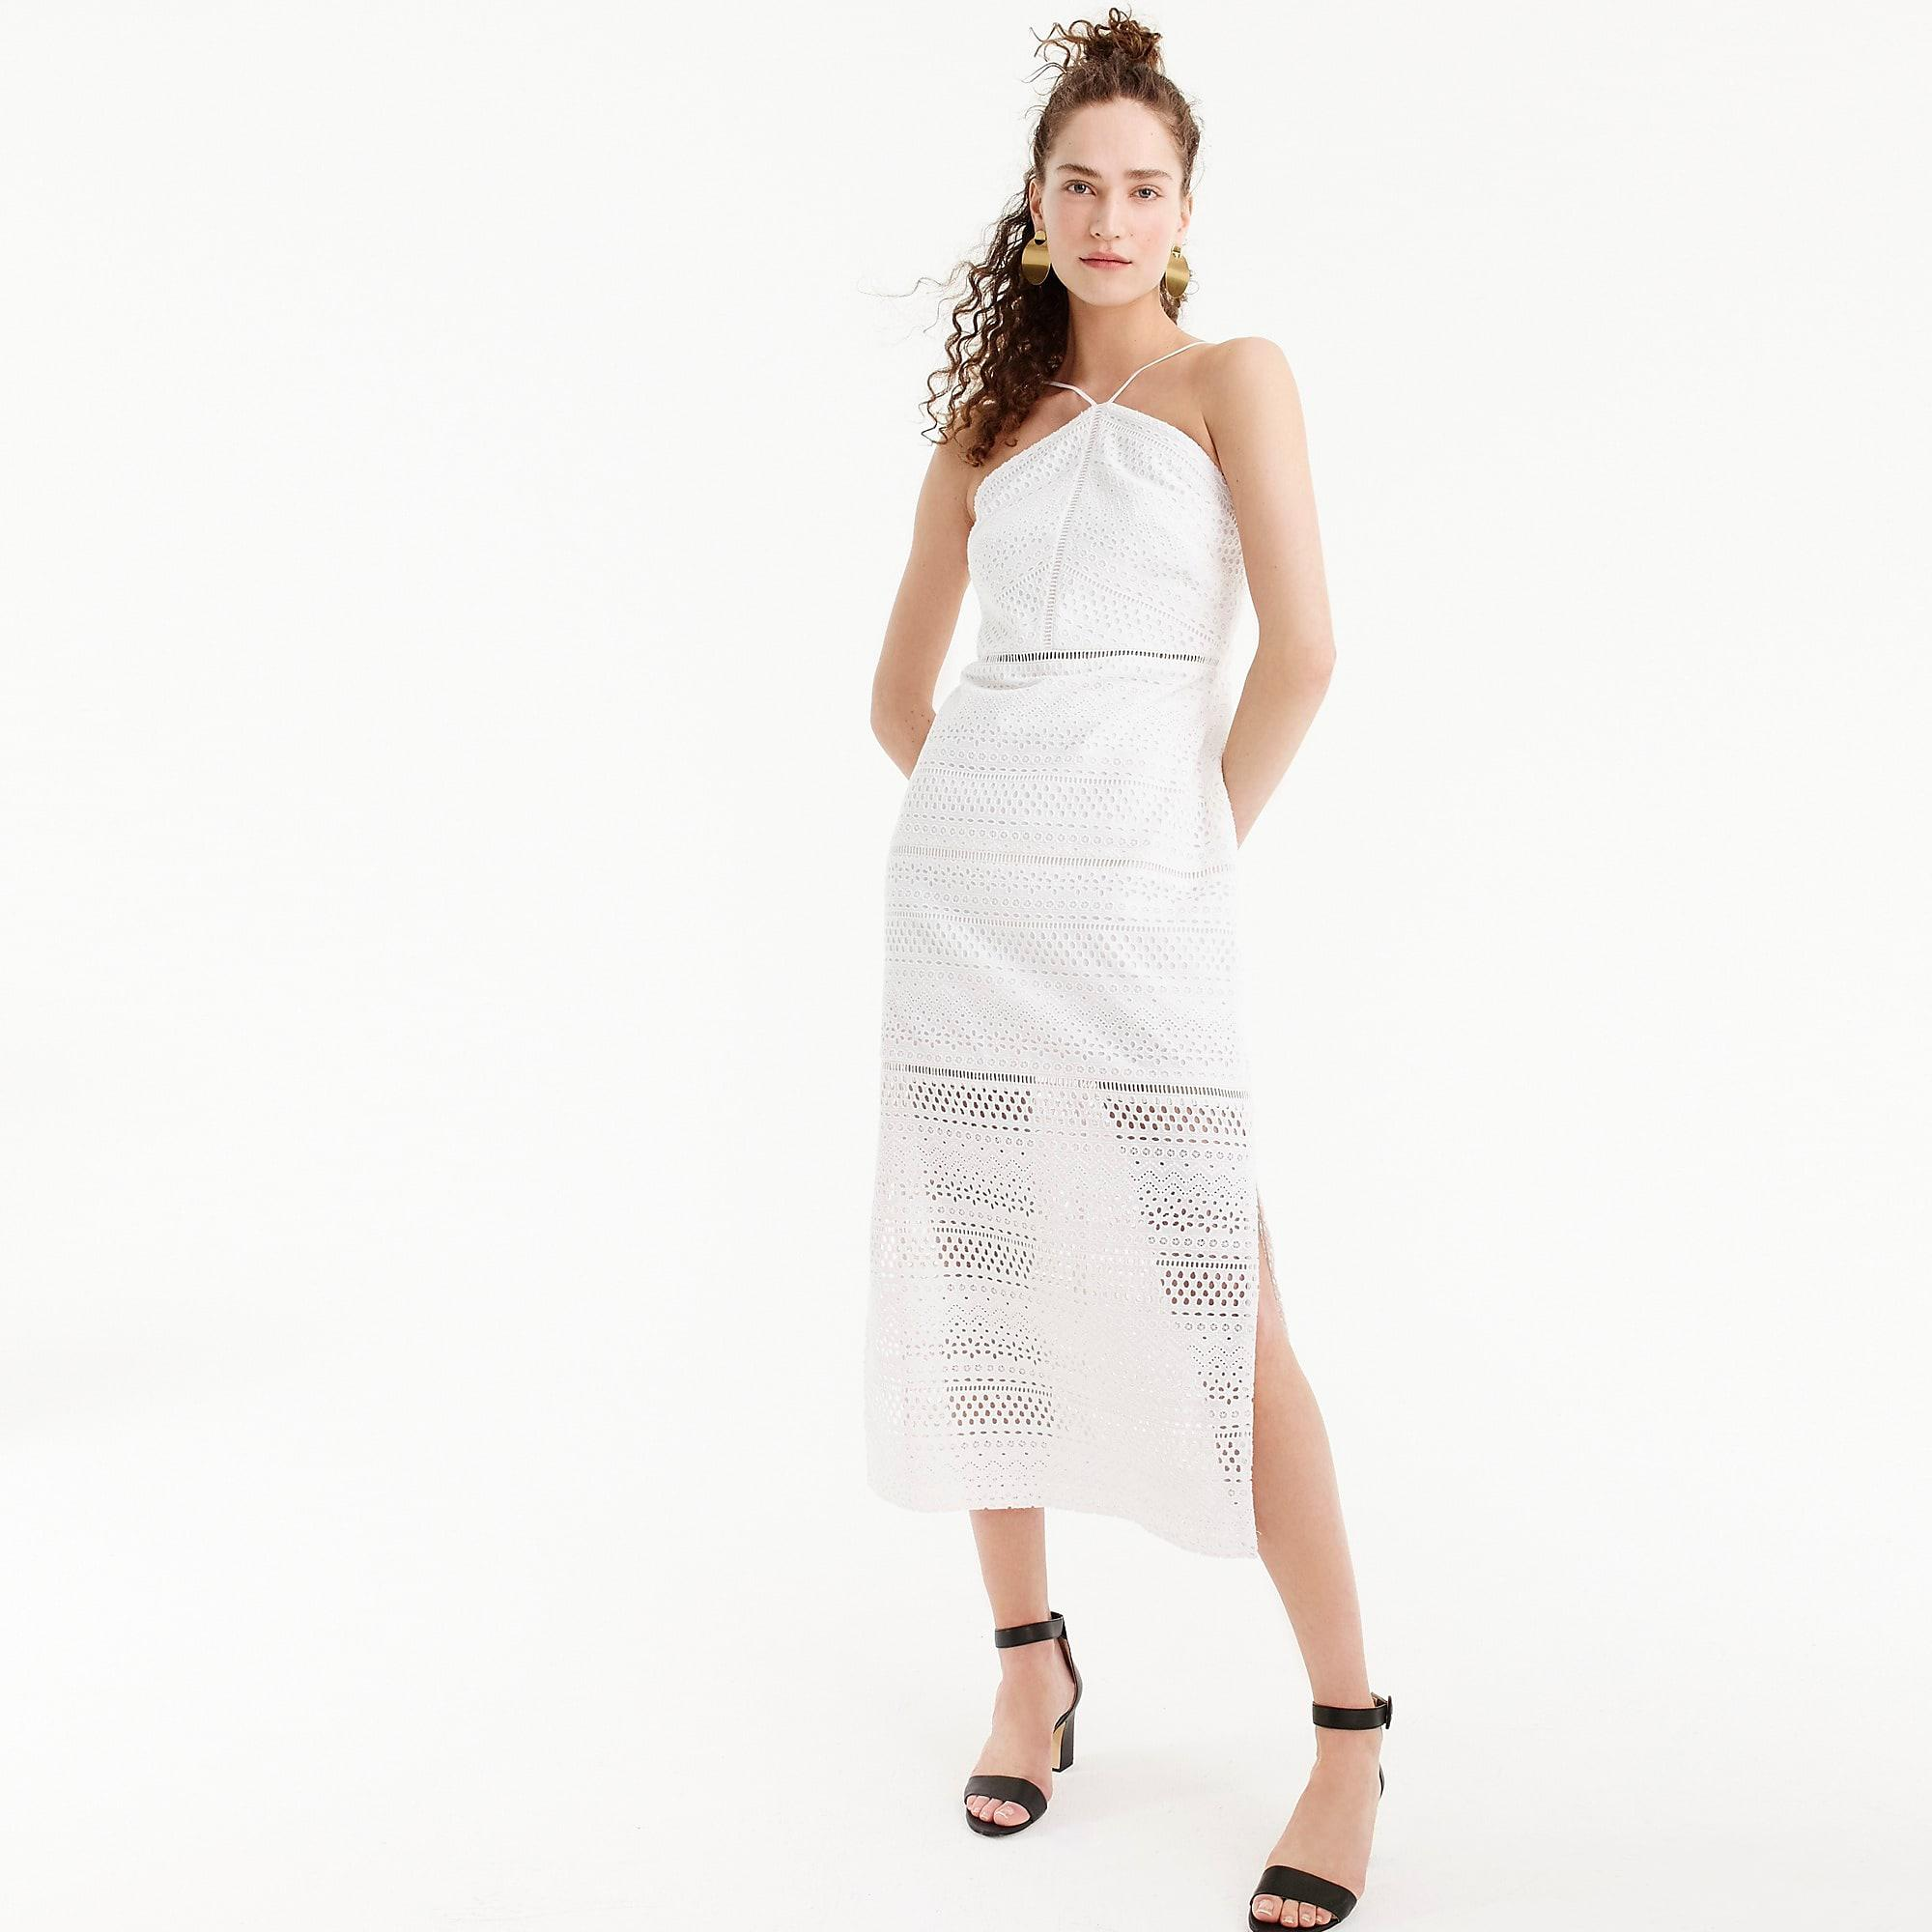 J.Crew String Halter Dress In Eyelet in White